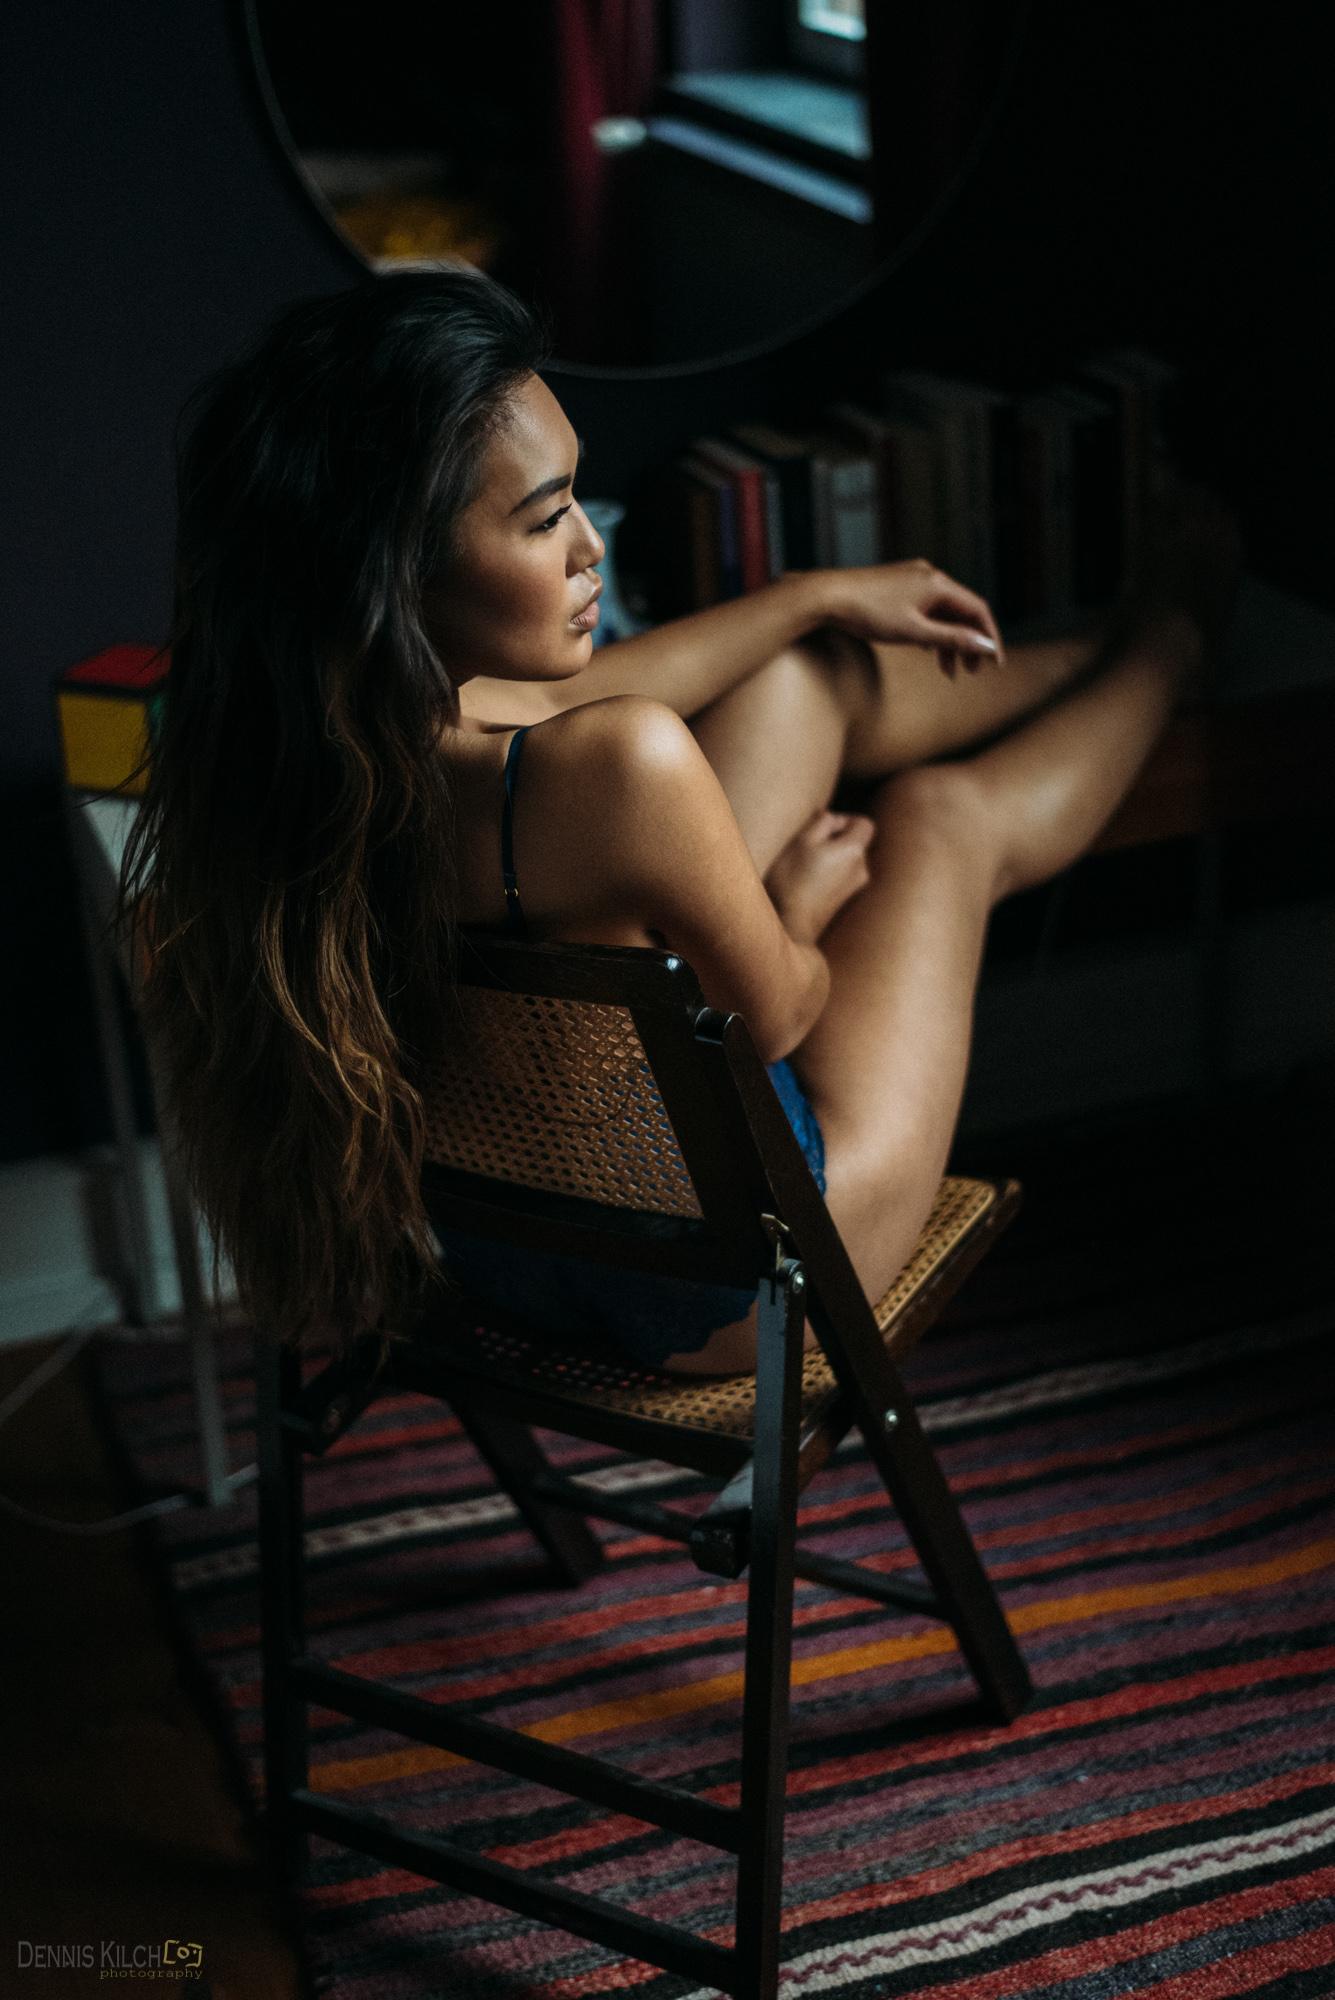 Lovely Mella / denniskilchphotography +